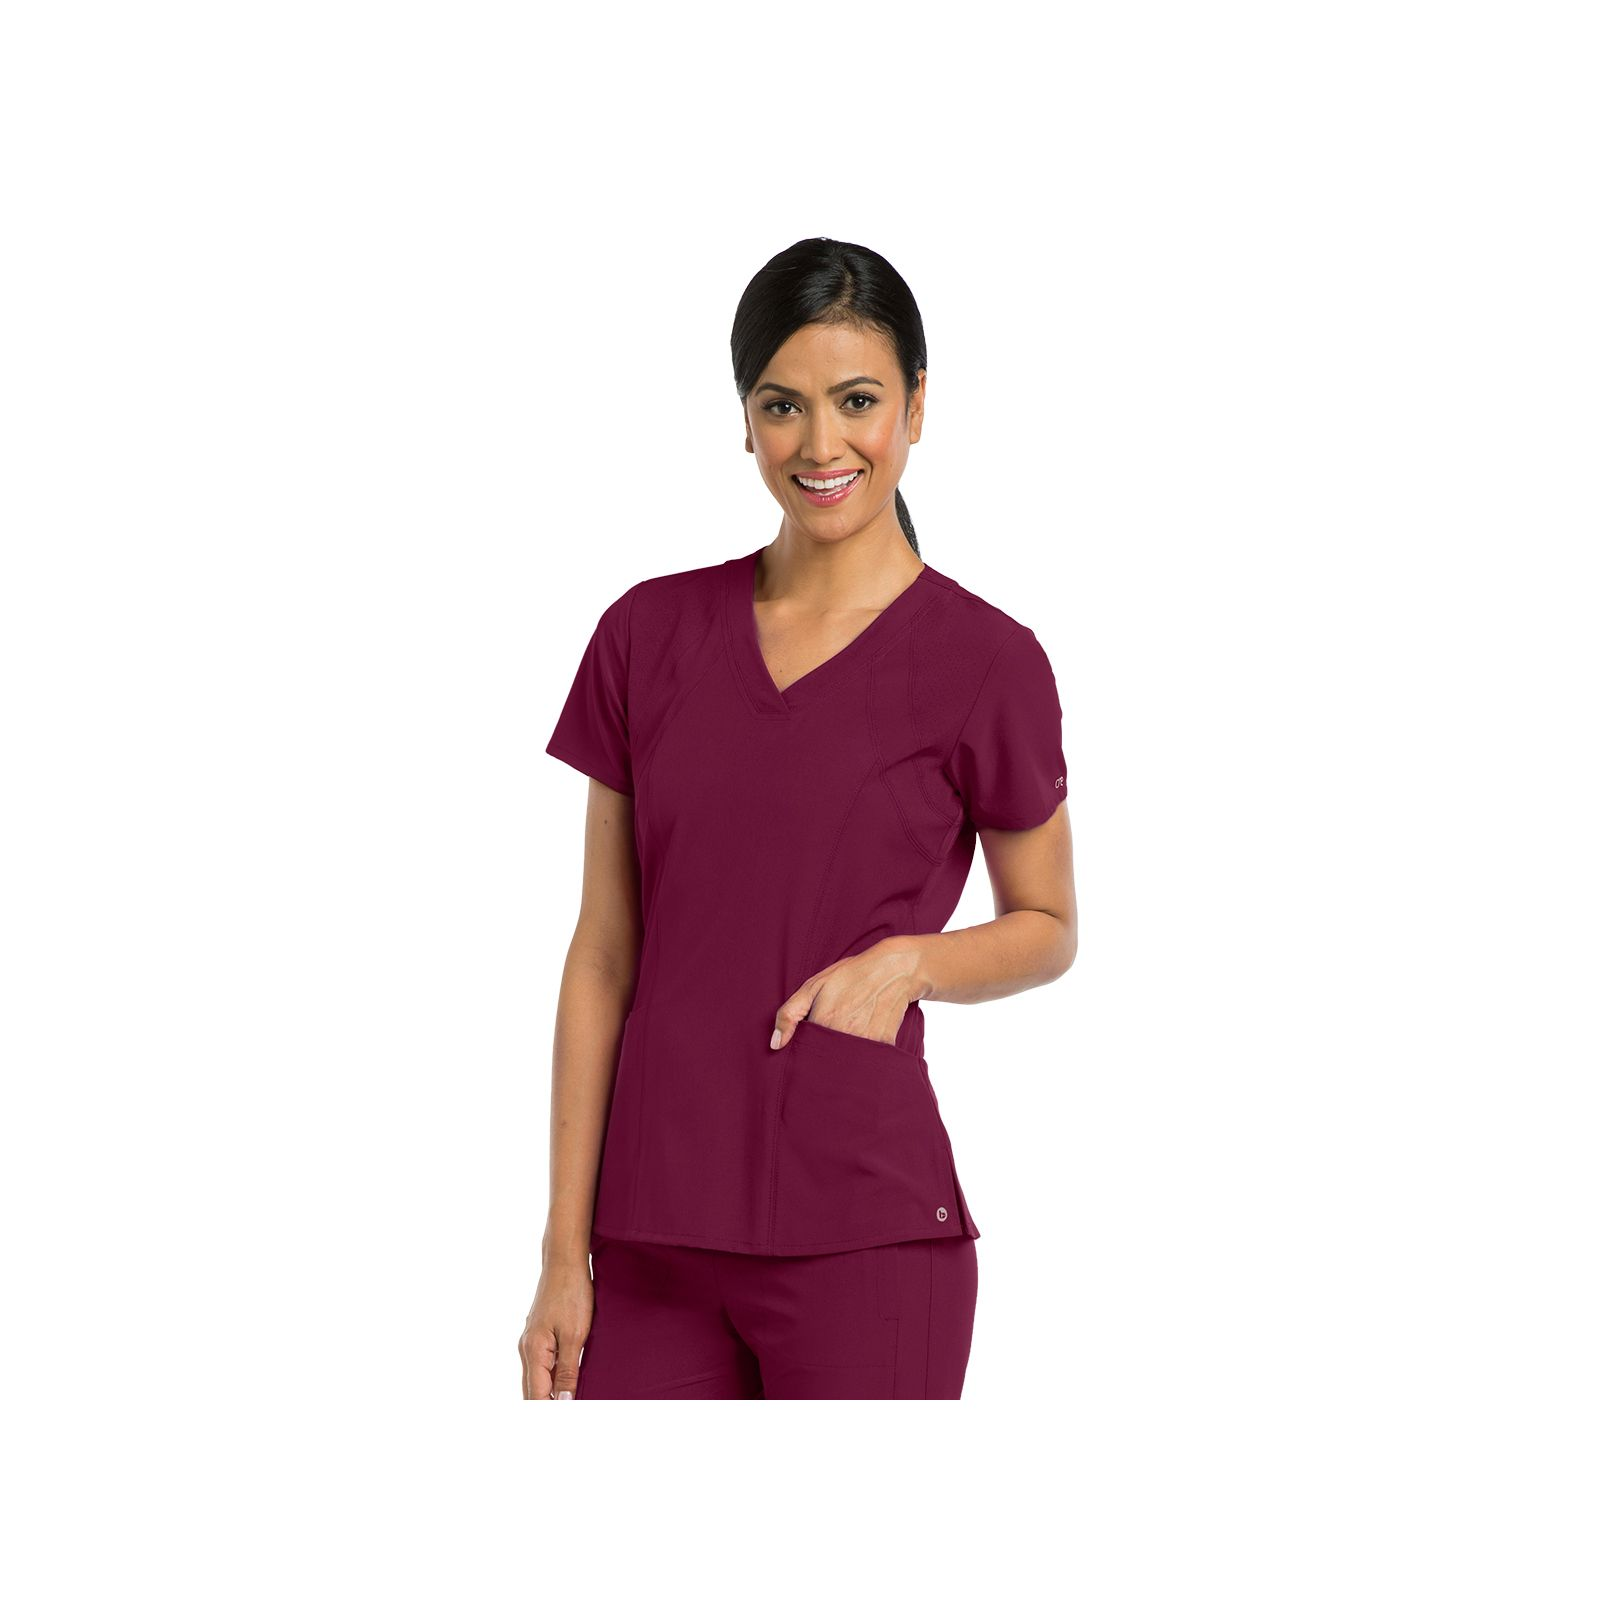 Blouse médicale femme, Barco One (5105)